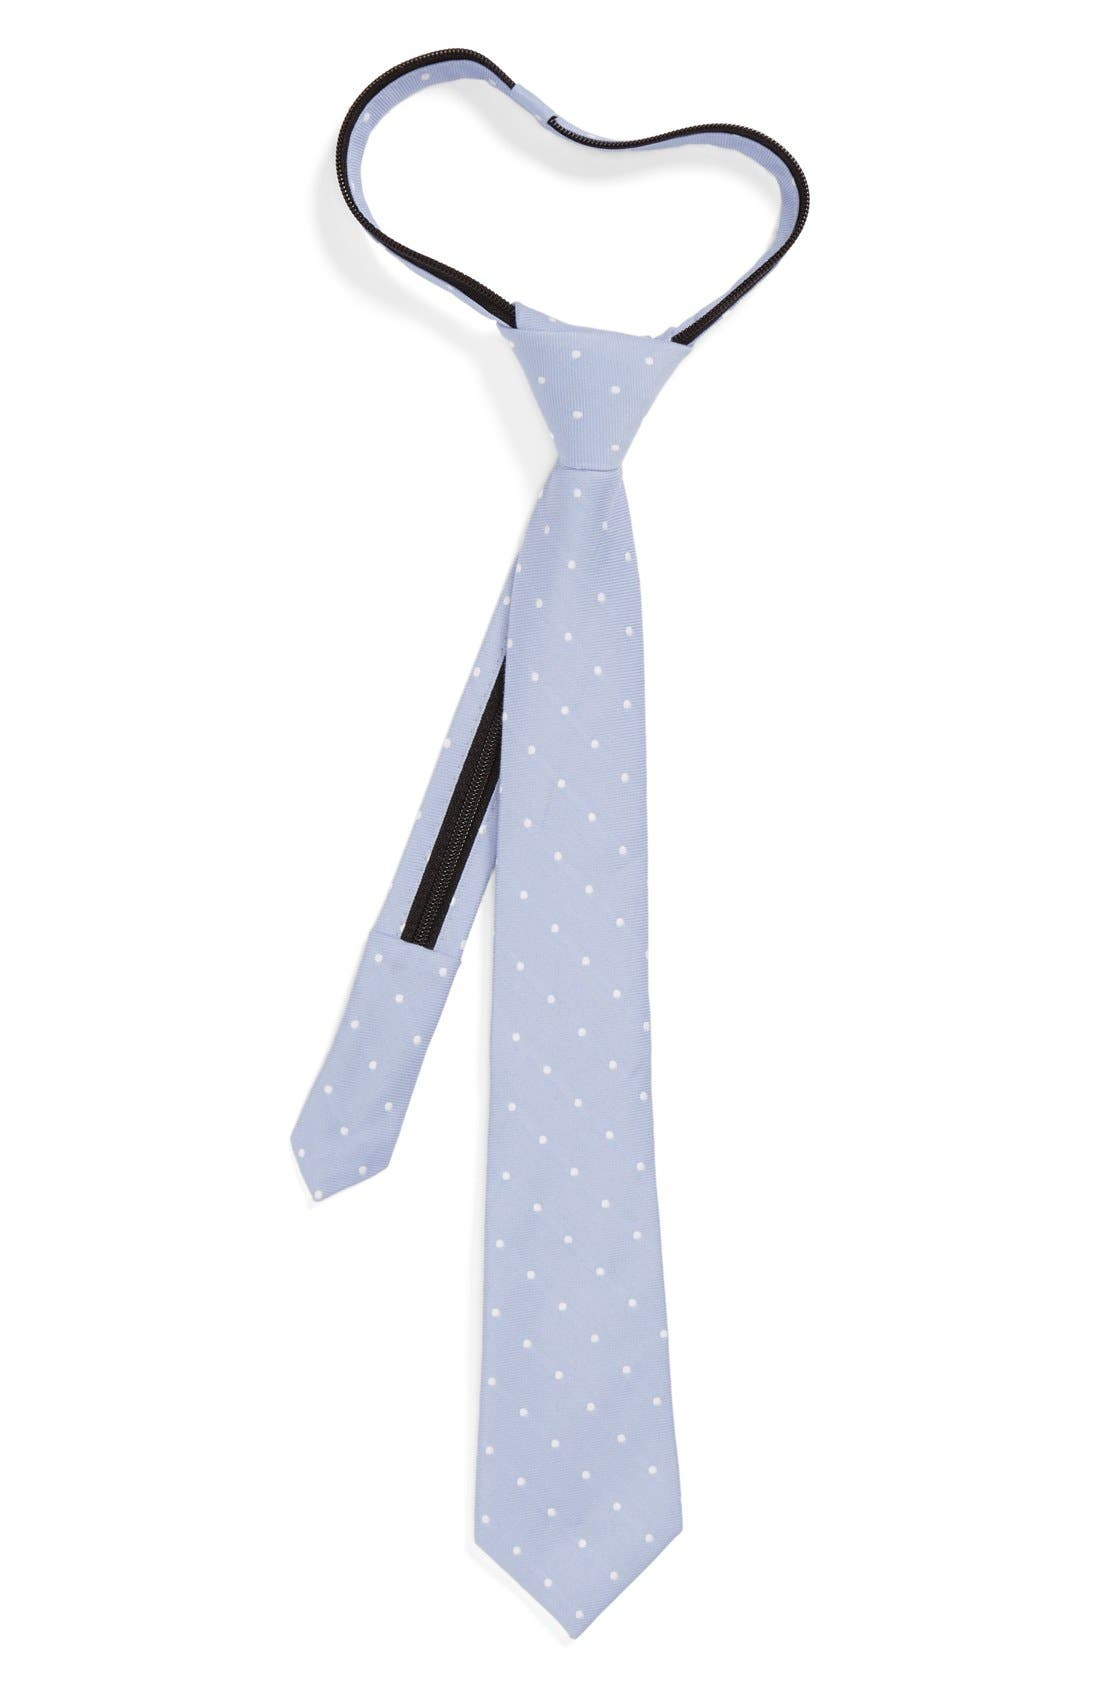 Alternate Image 1 Selected - Nordstrom Cotton & Silk Zipper Tie (Big Boys)